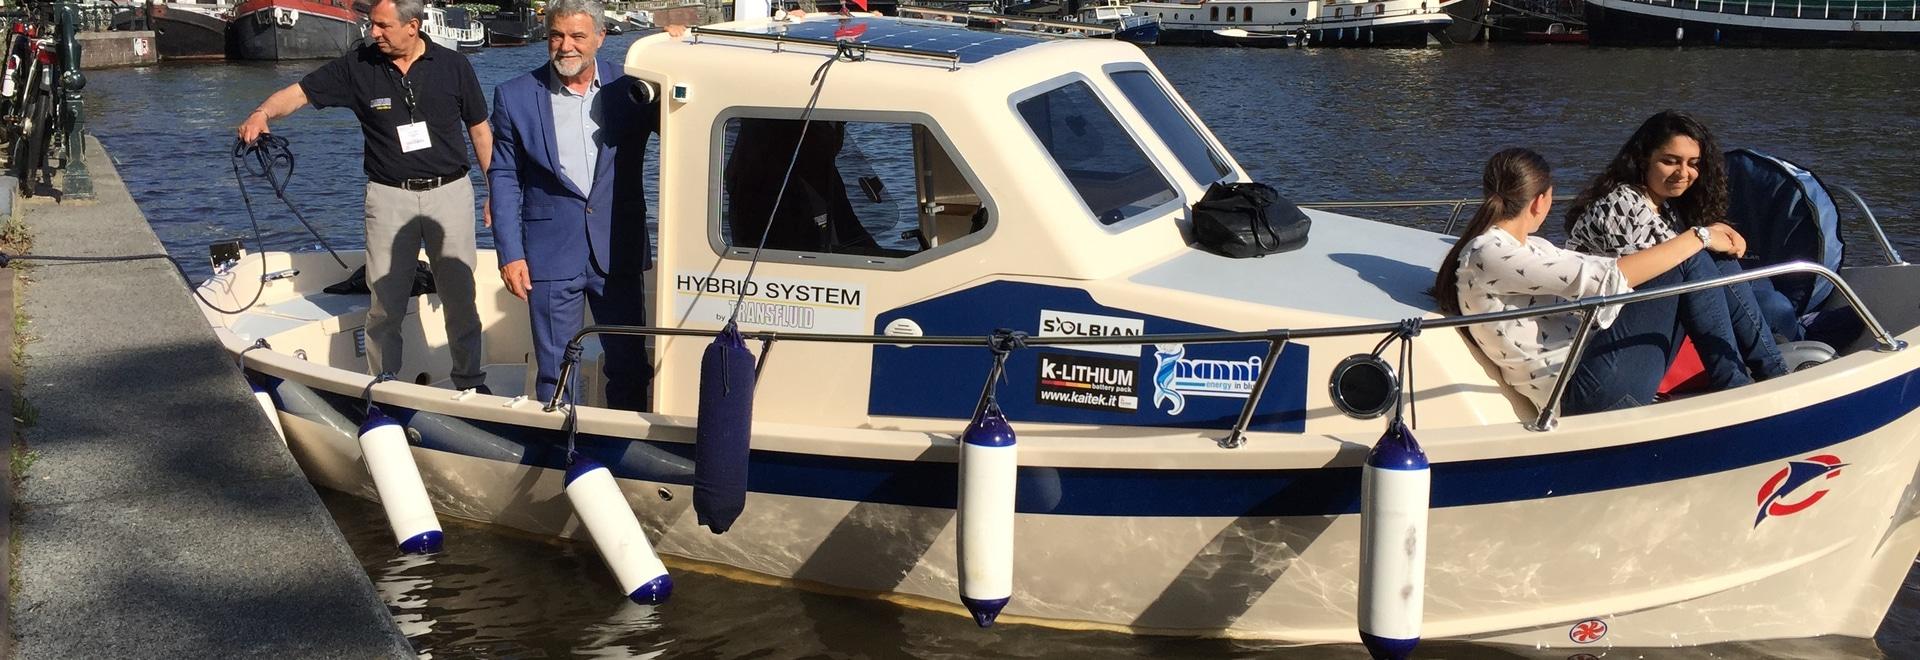 Hybrid propulsion boat with Solbian solar panel